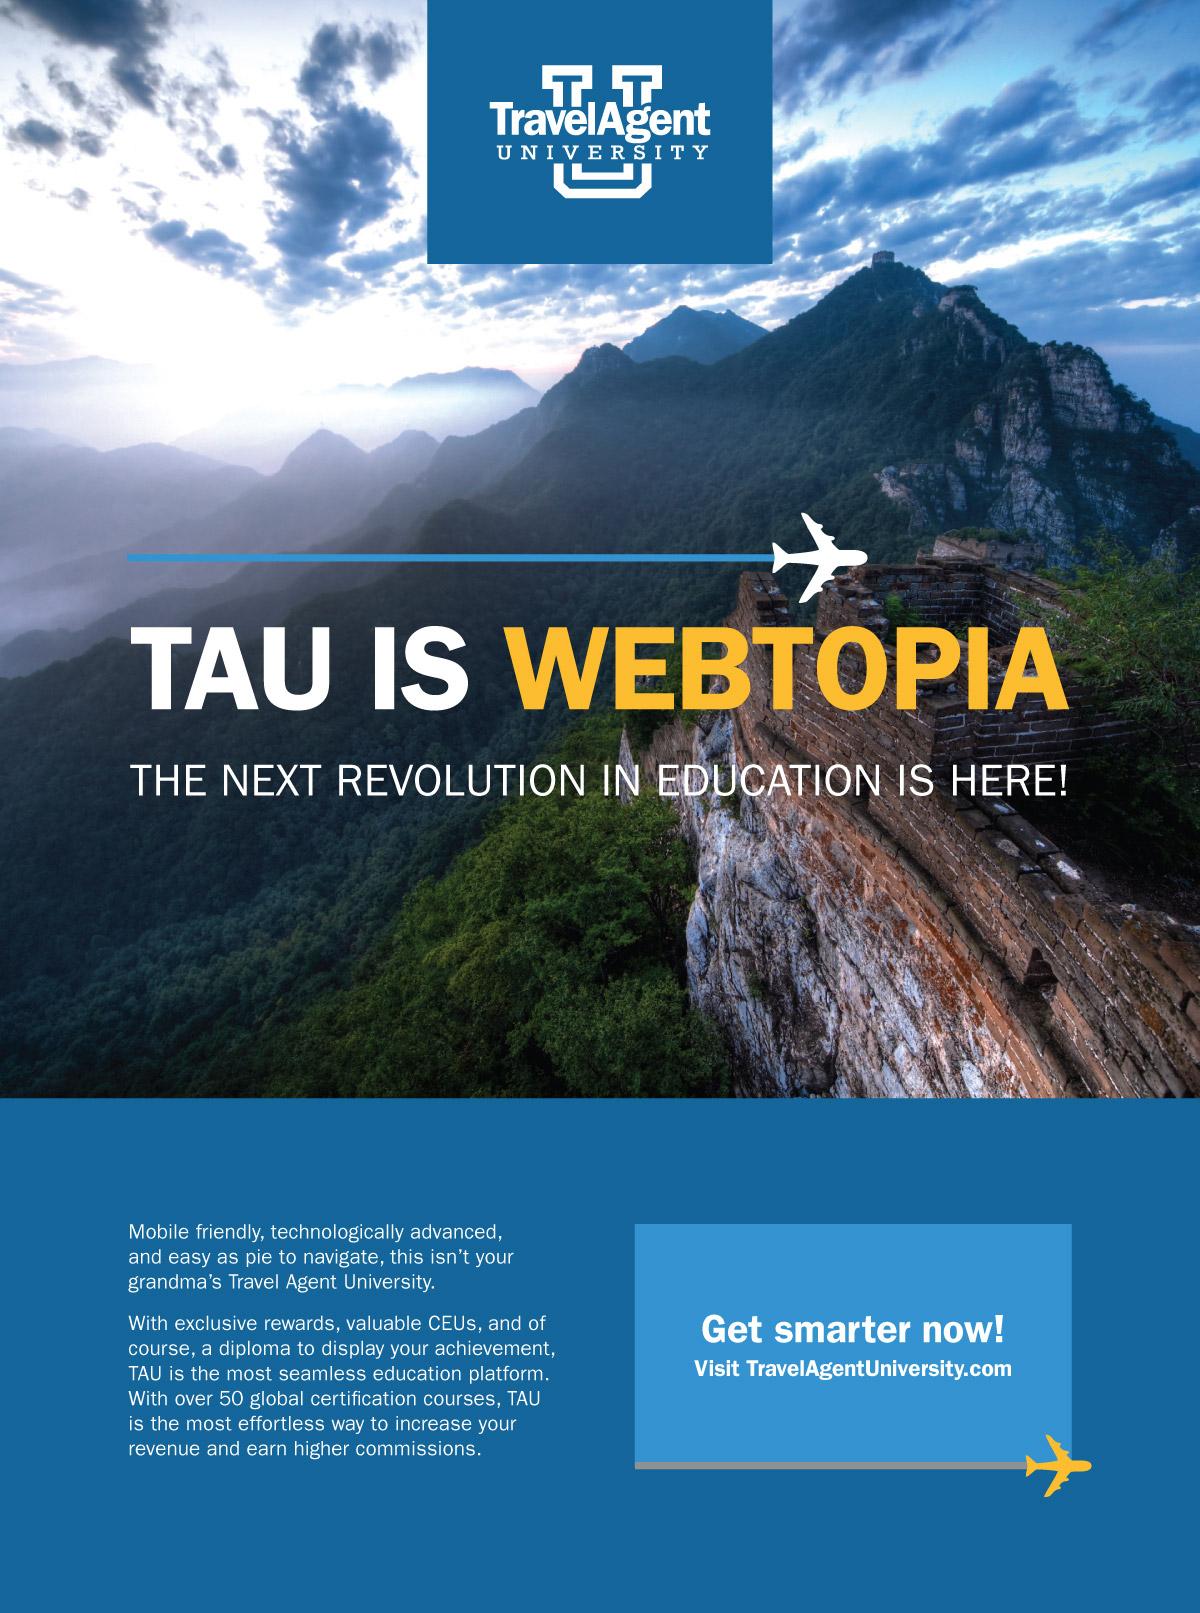 Travel Agent University Ad